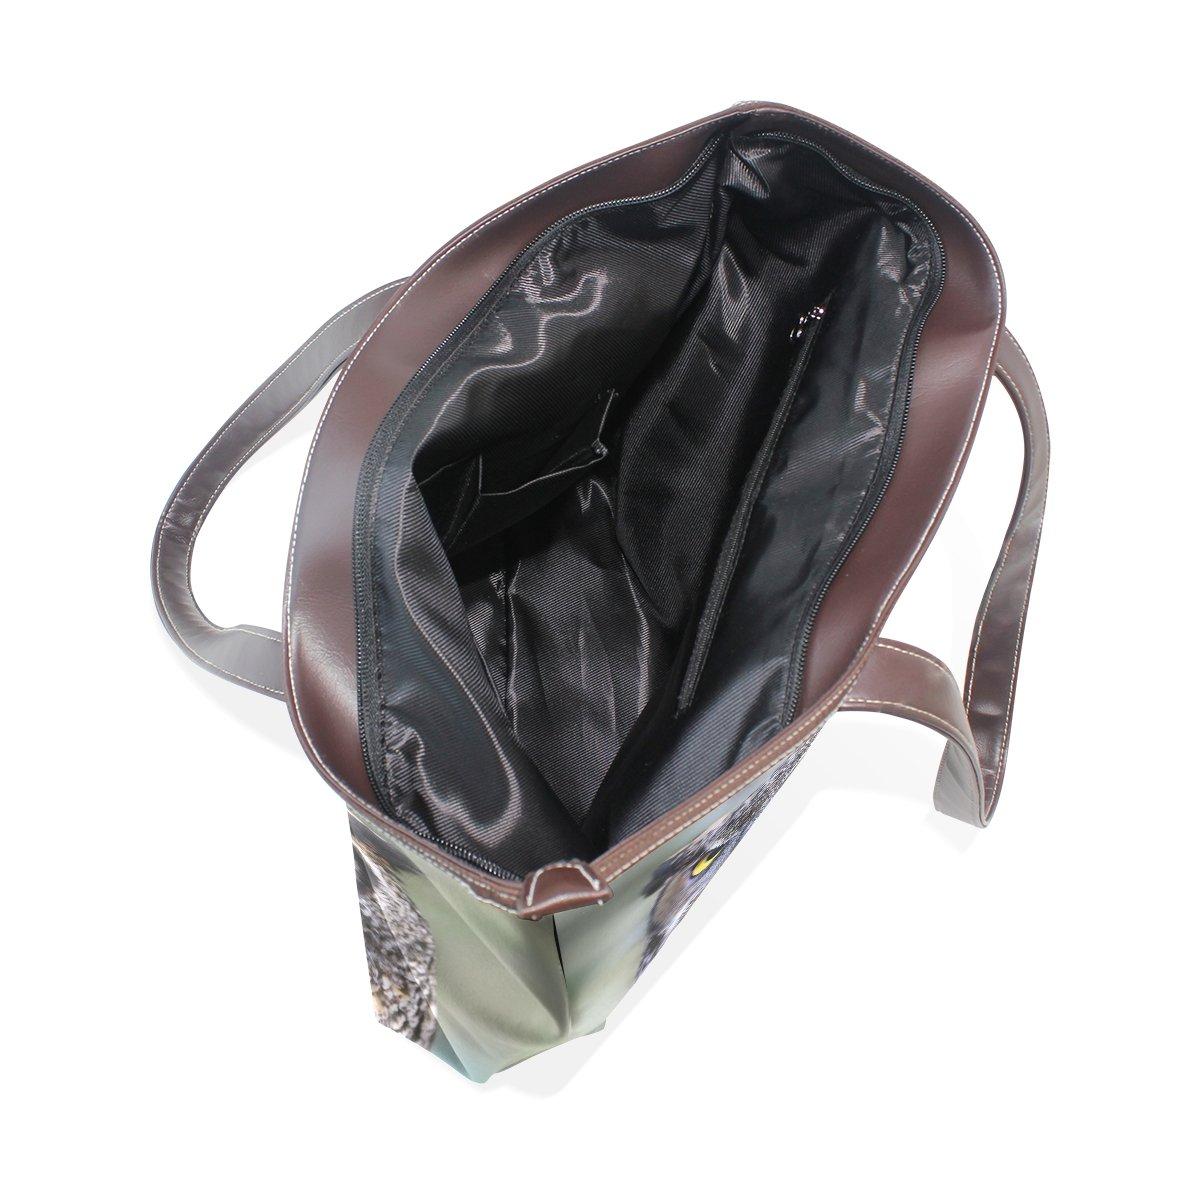 SCDS Painting The Owl PU Leather Lady Handbag Tote Bag Zipper Shoulder Bag